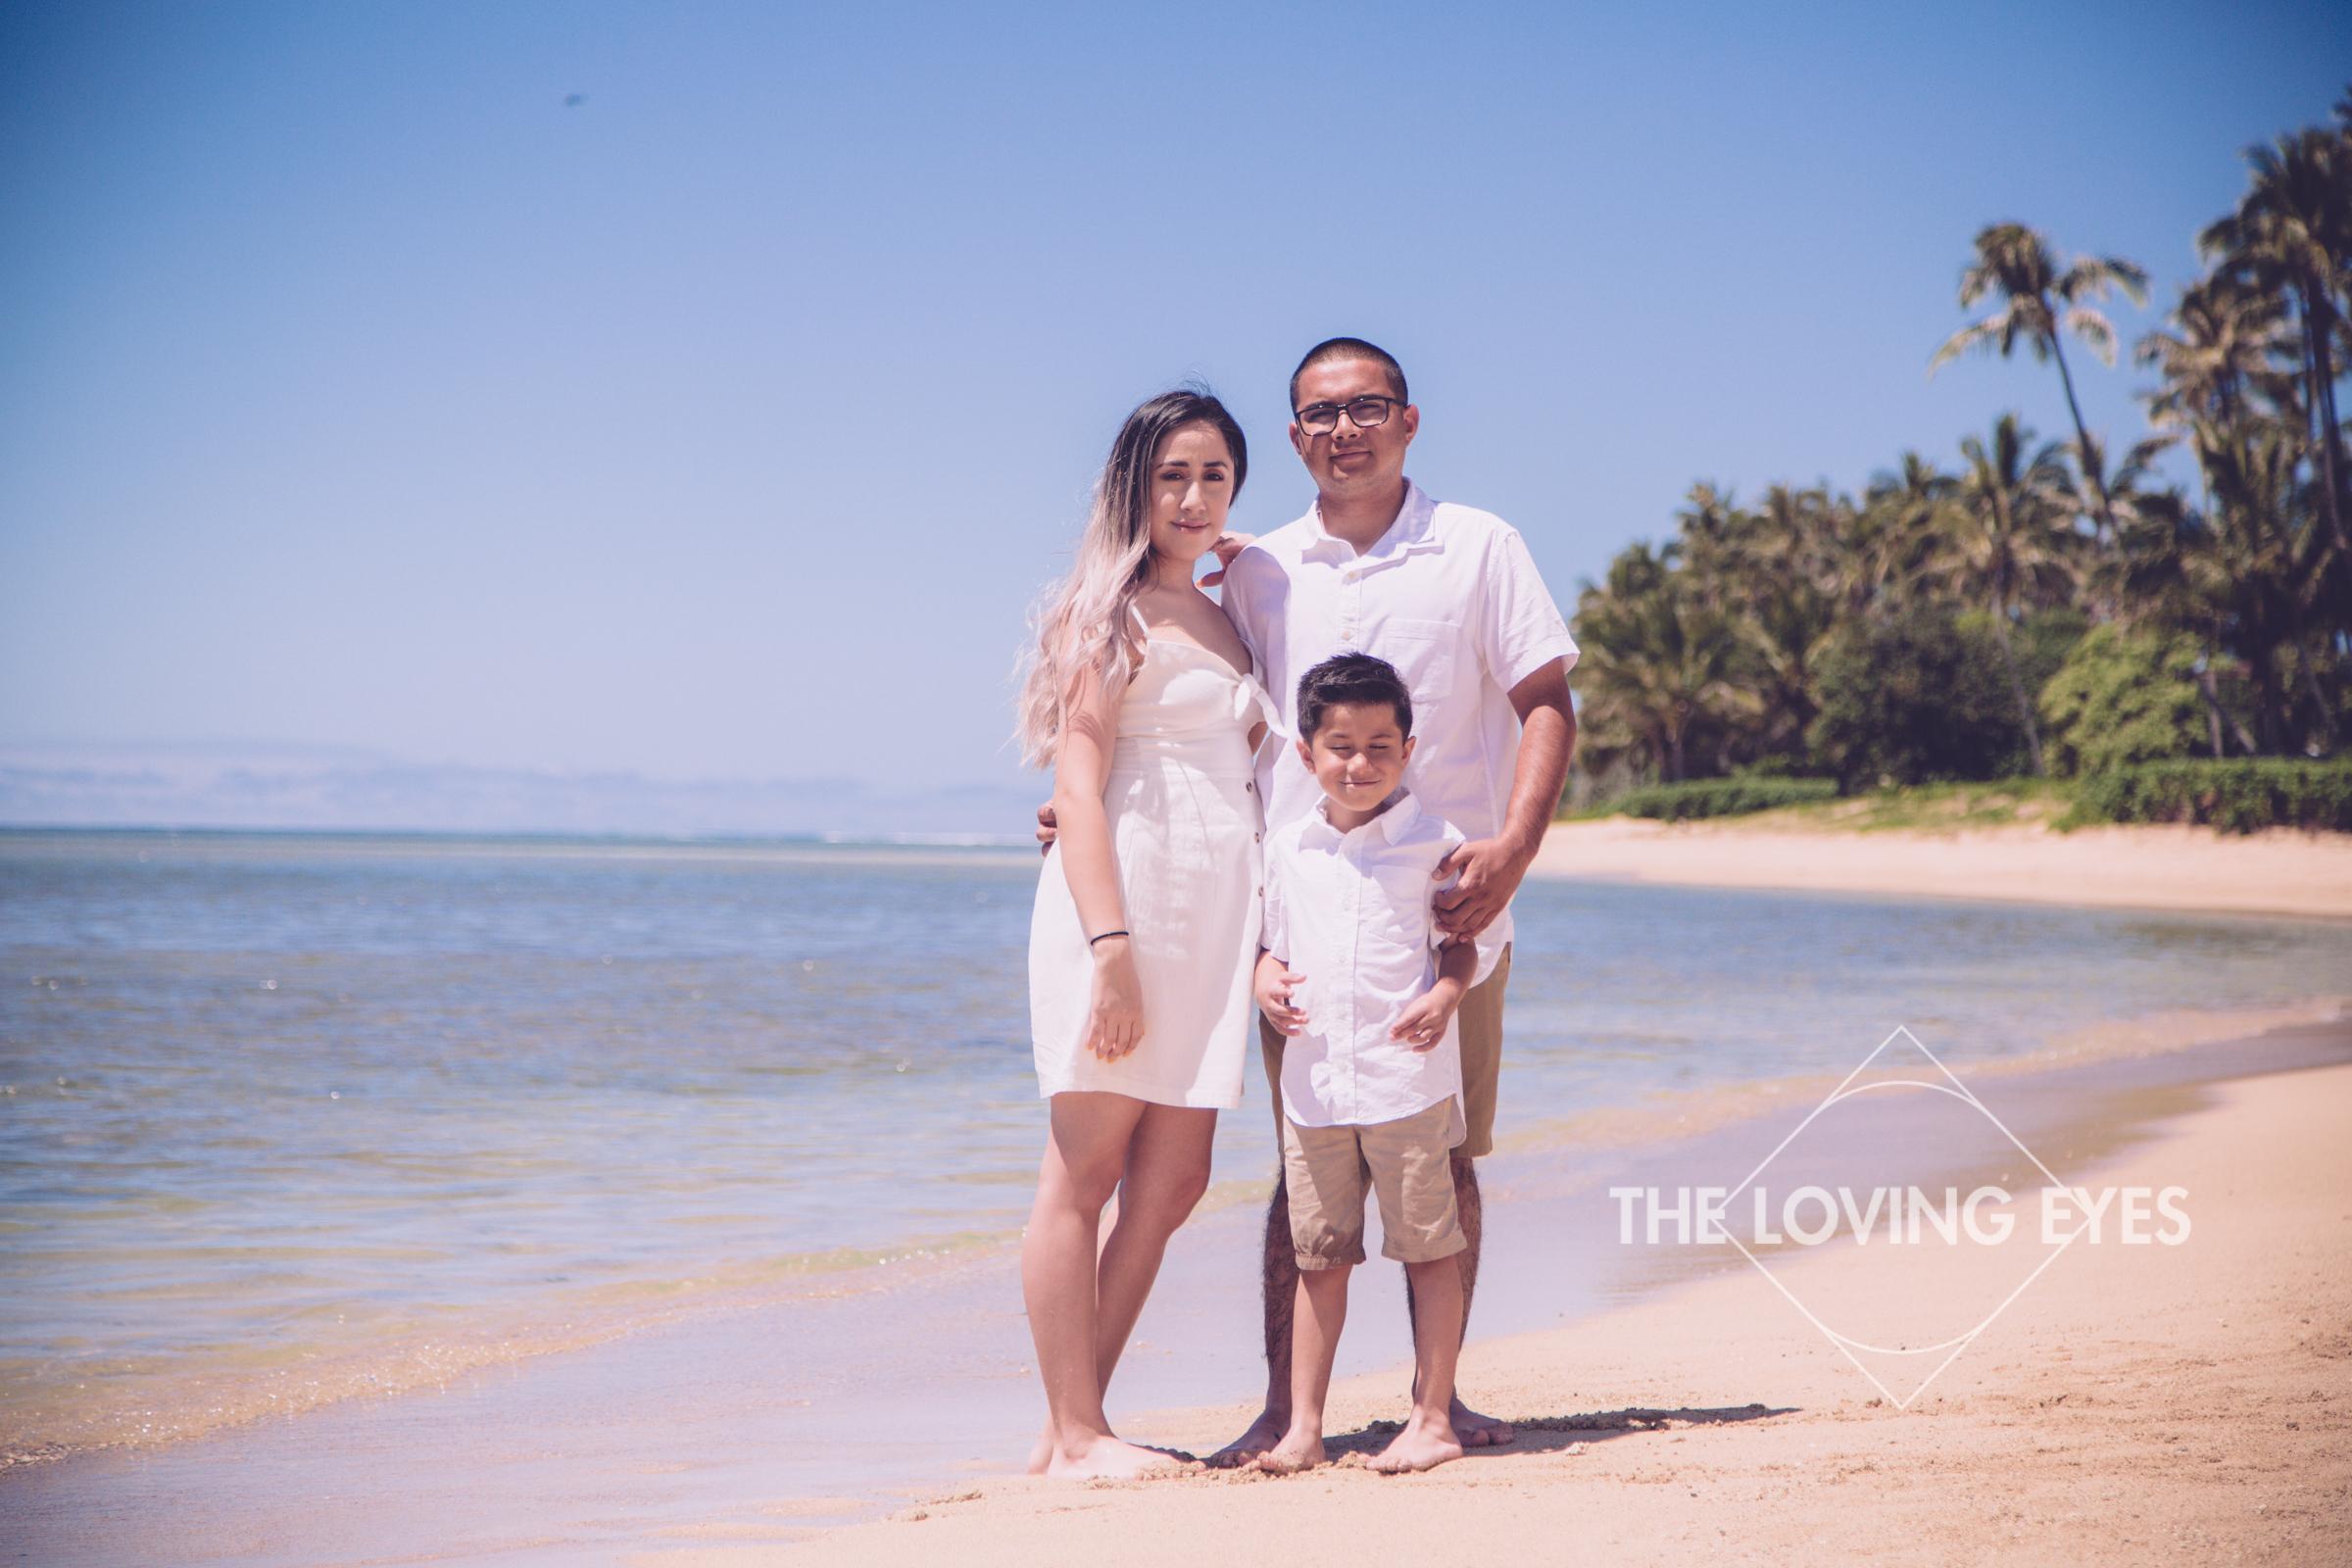 Hawaii vacation beach photo-5.jpg